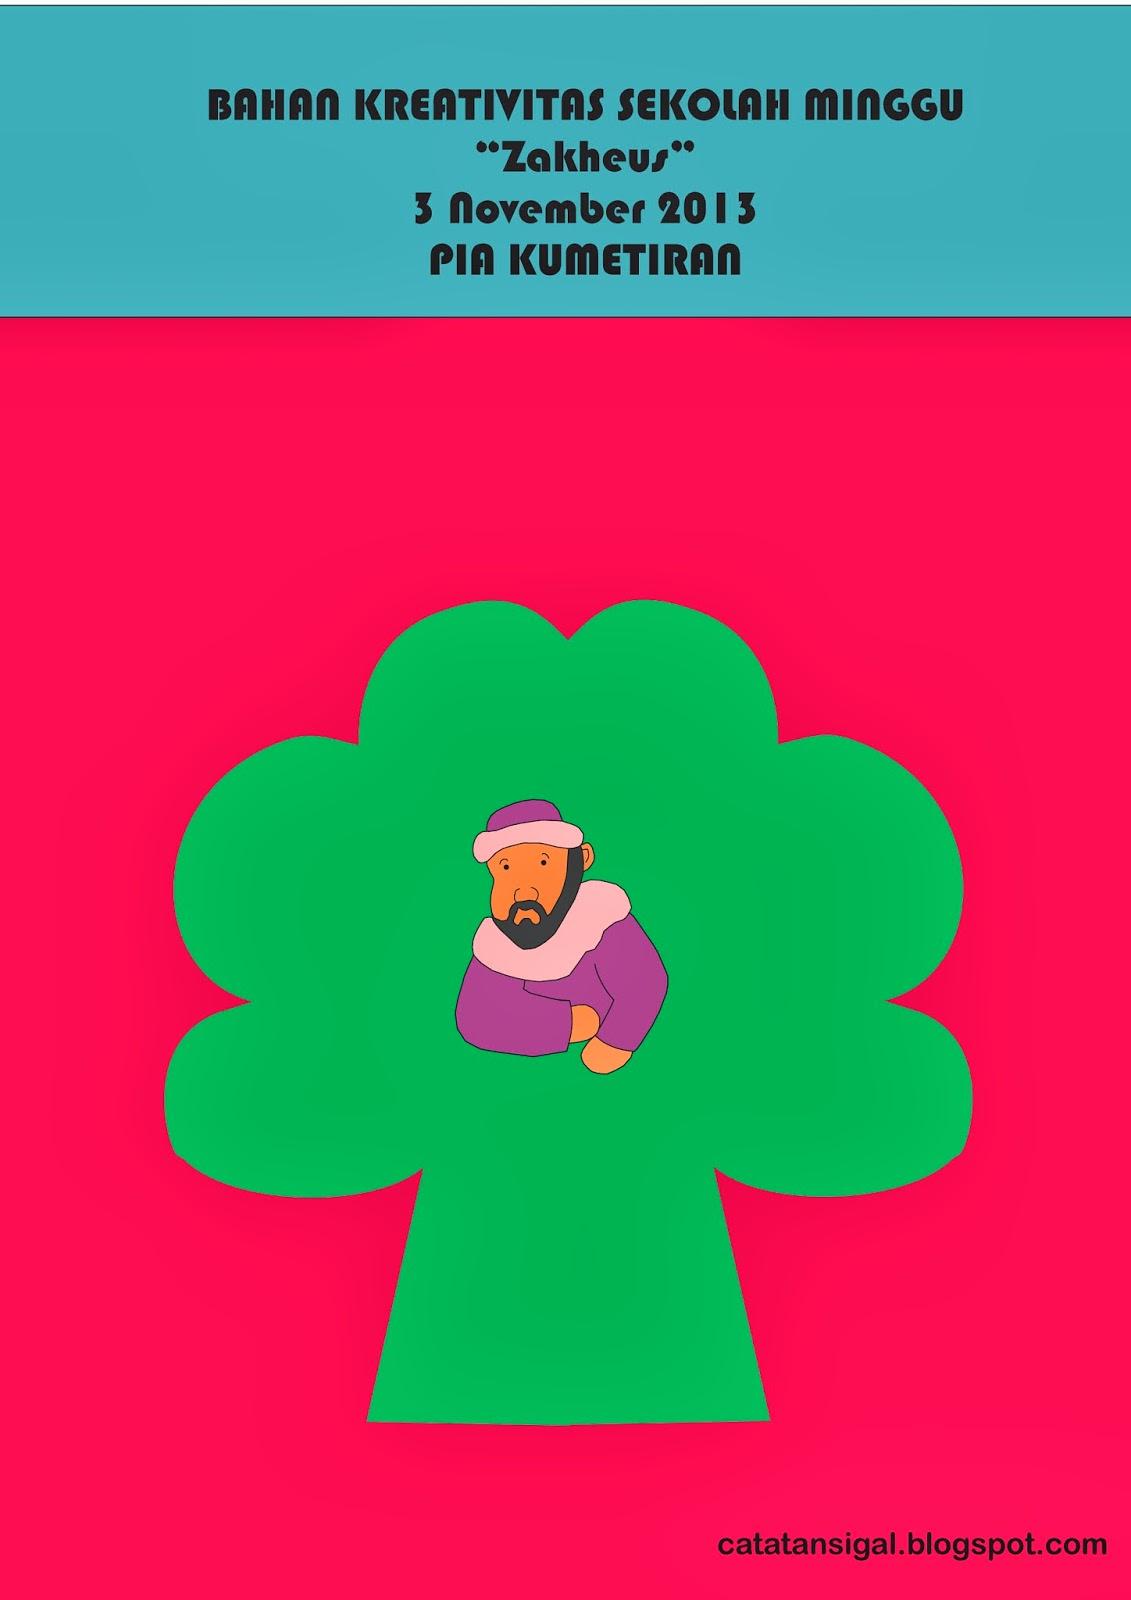 "Bahan Kreativitas Sekolah Minggu ""Pertobatan Zakheus"" 3 November 2013 PIA Kumetiran"